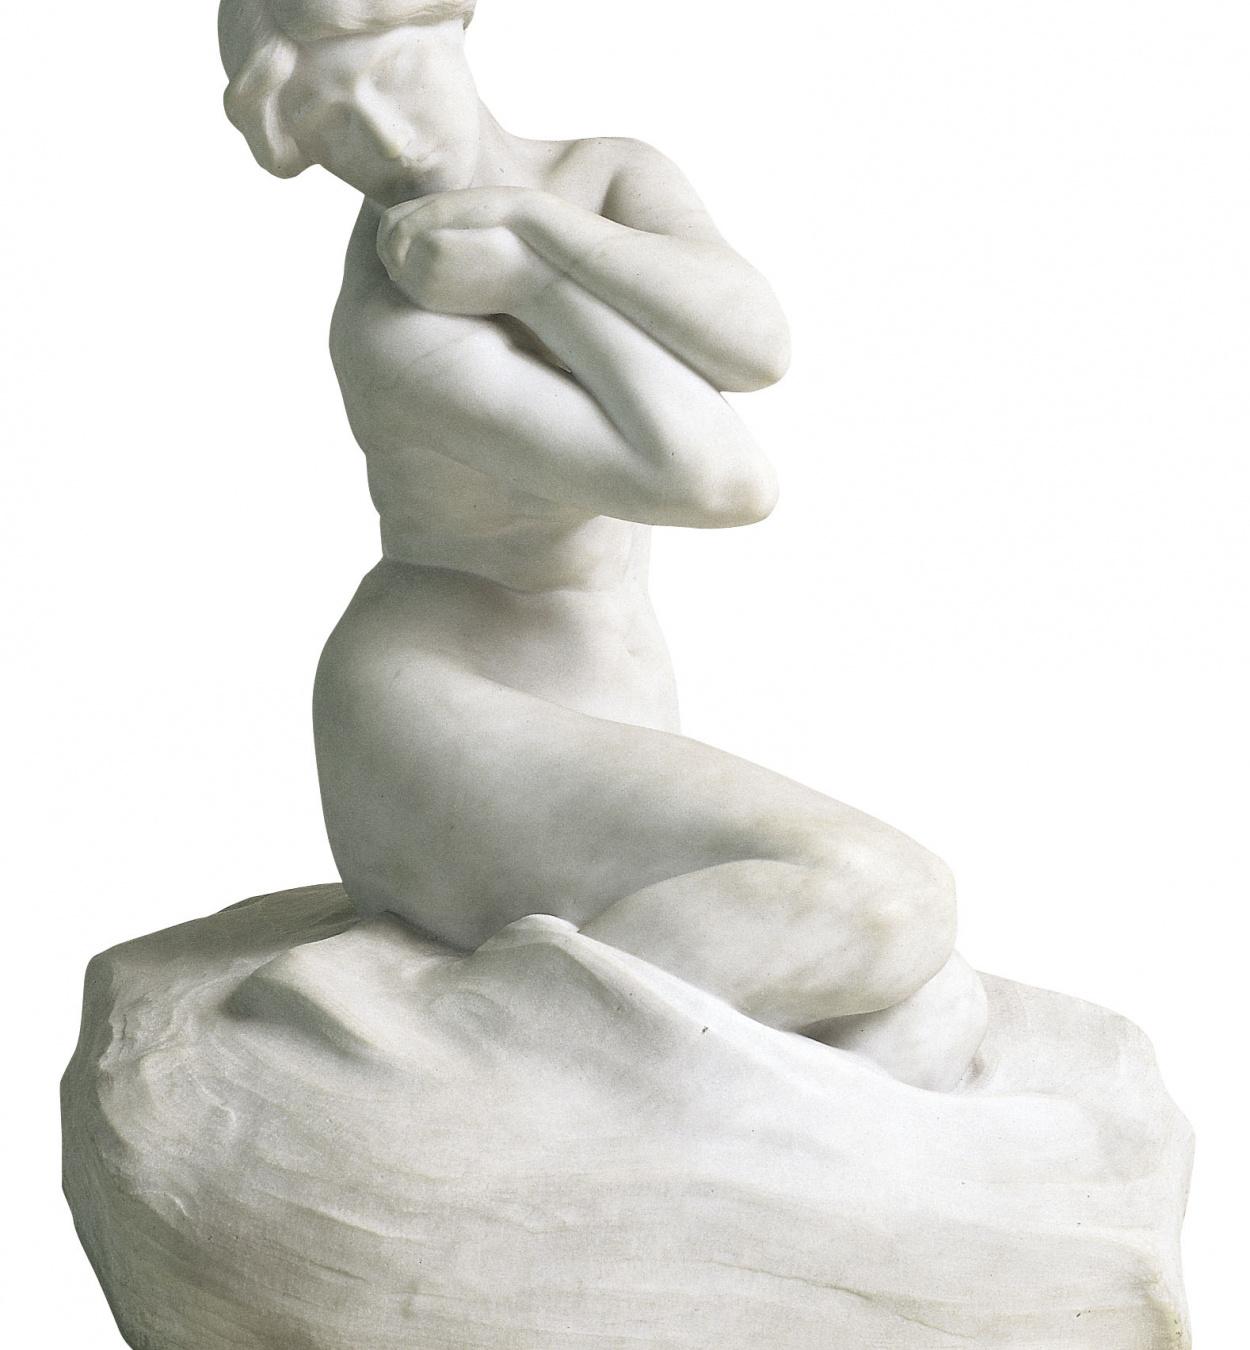 Josep Llimona - Female Nude - 1918